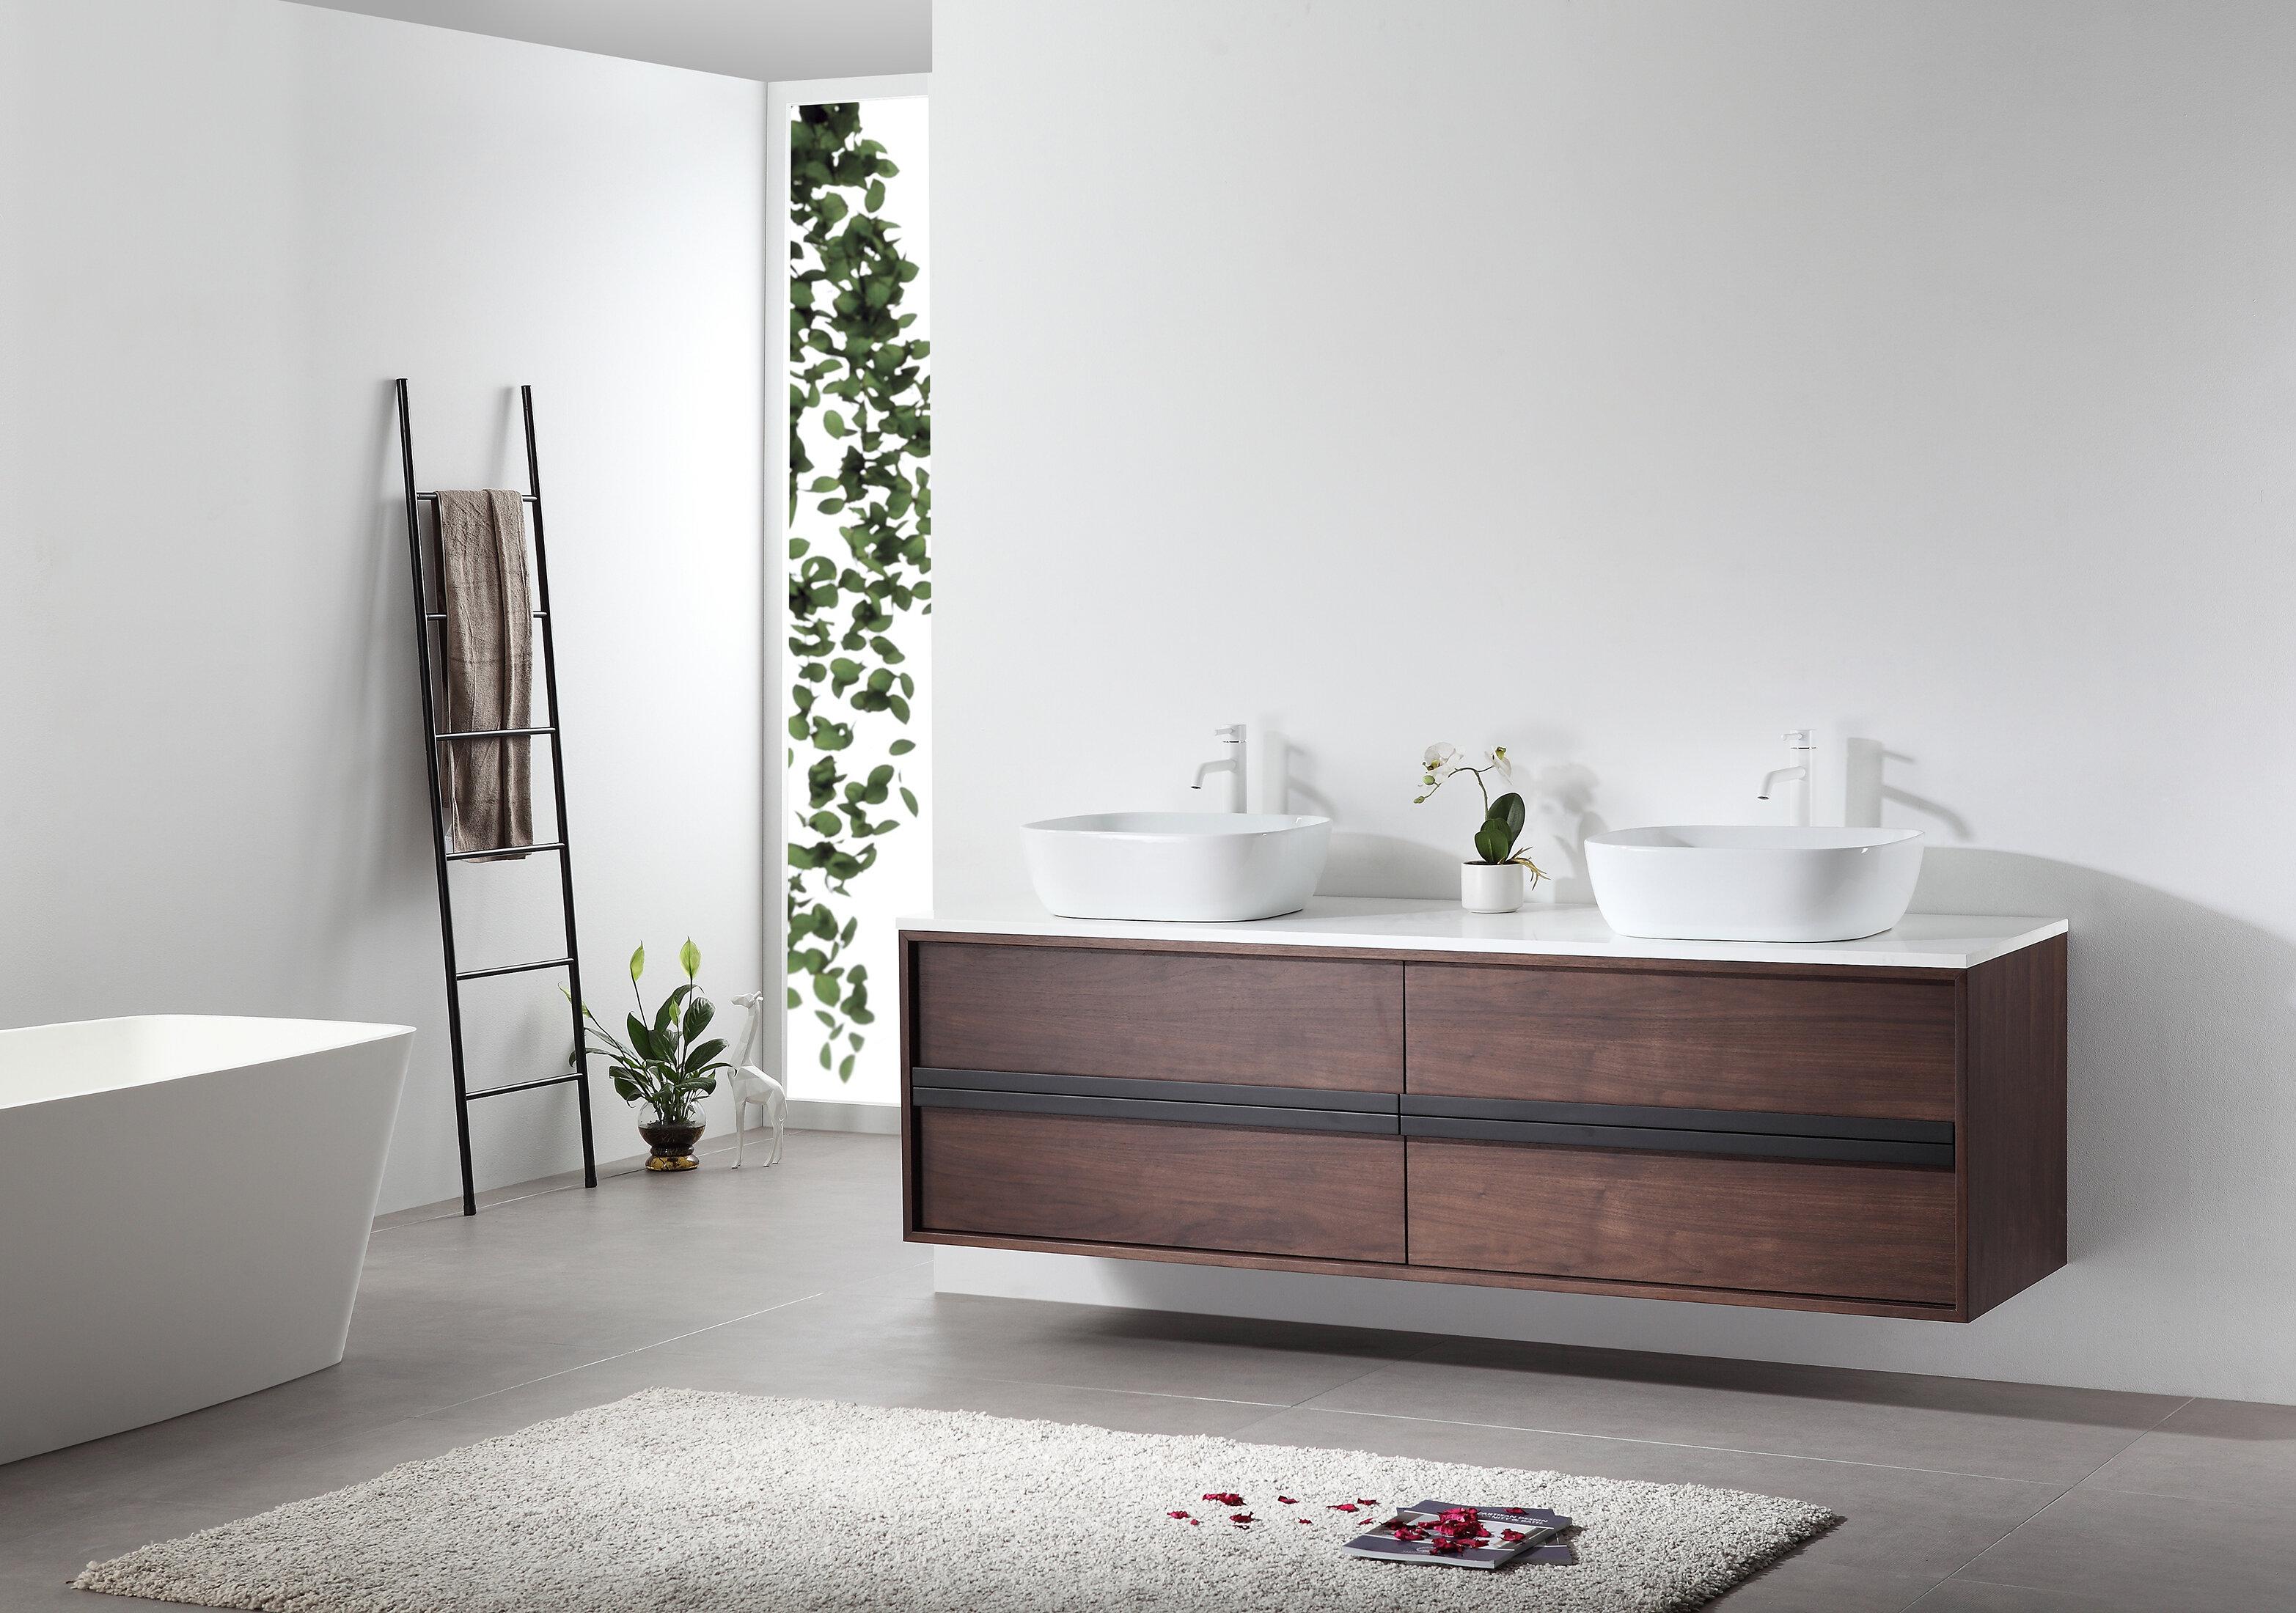 Kartonrepublic Sintra 72 Wall Mounted Double Bathroom Vanity Set Reviews Wayfair